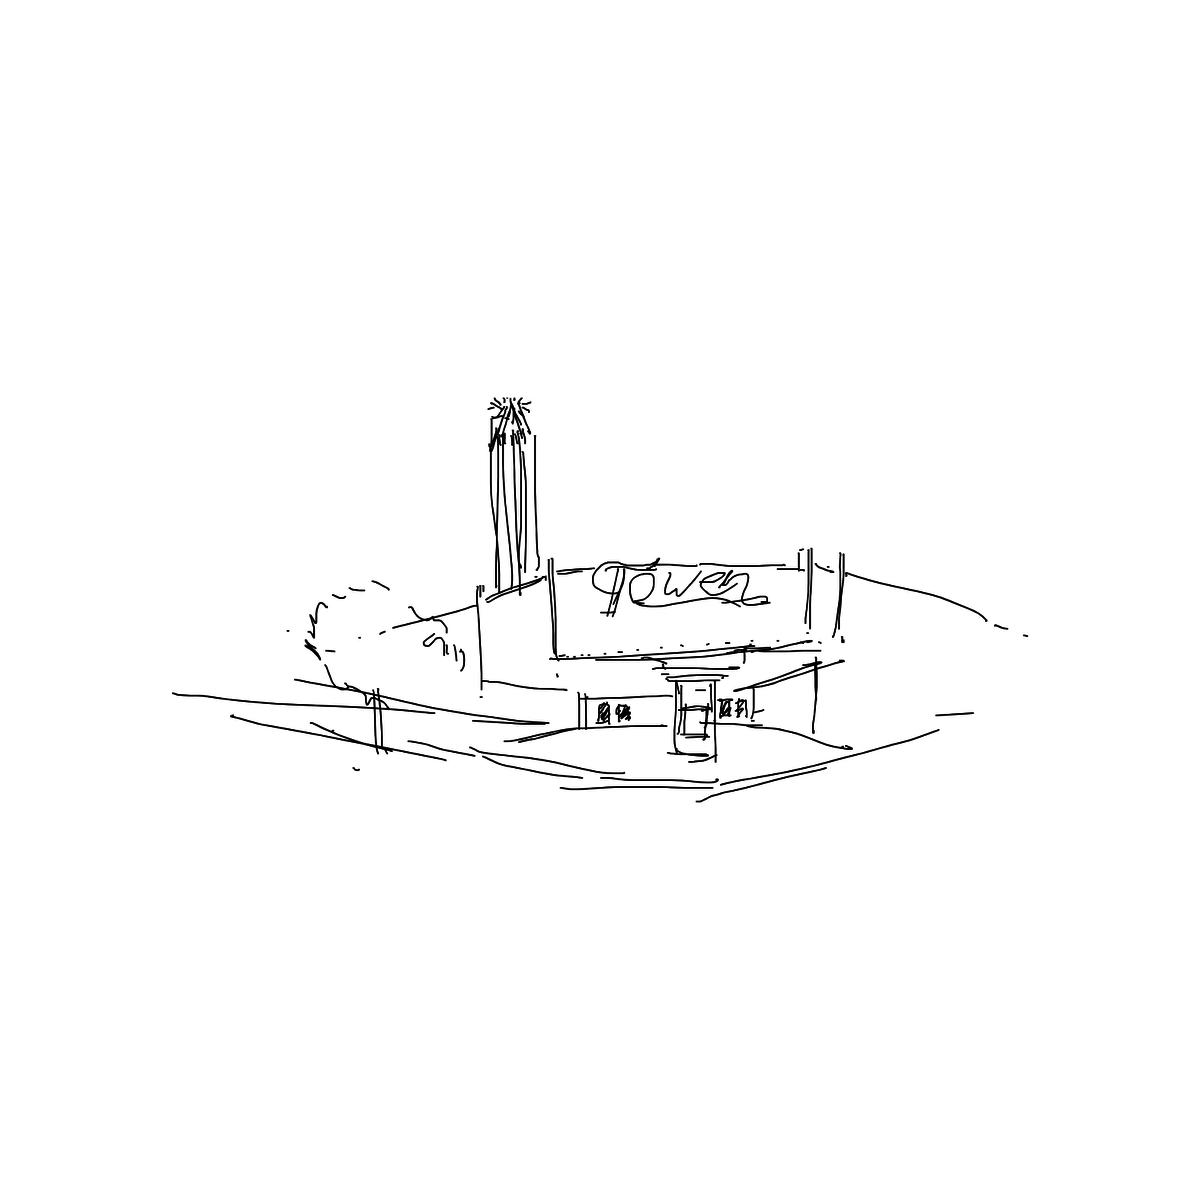 BAAAM drawing#24291 lat:36.7578201293945300lng: -119.8013076782226600